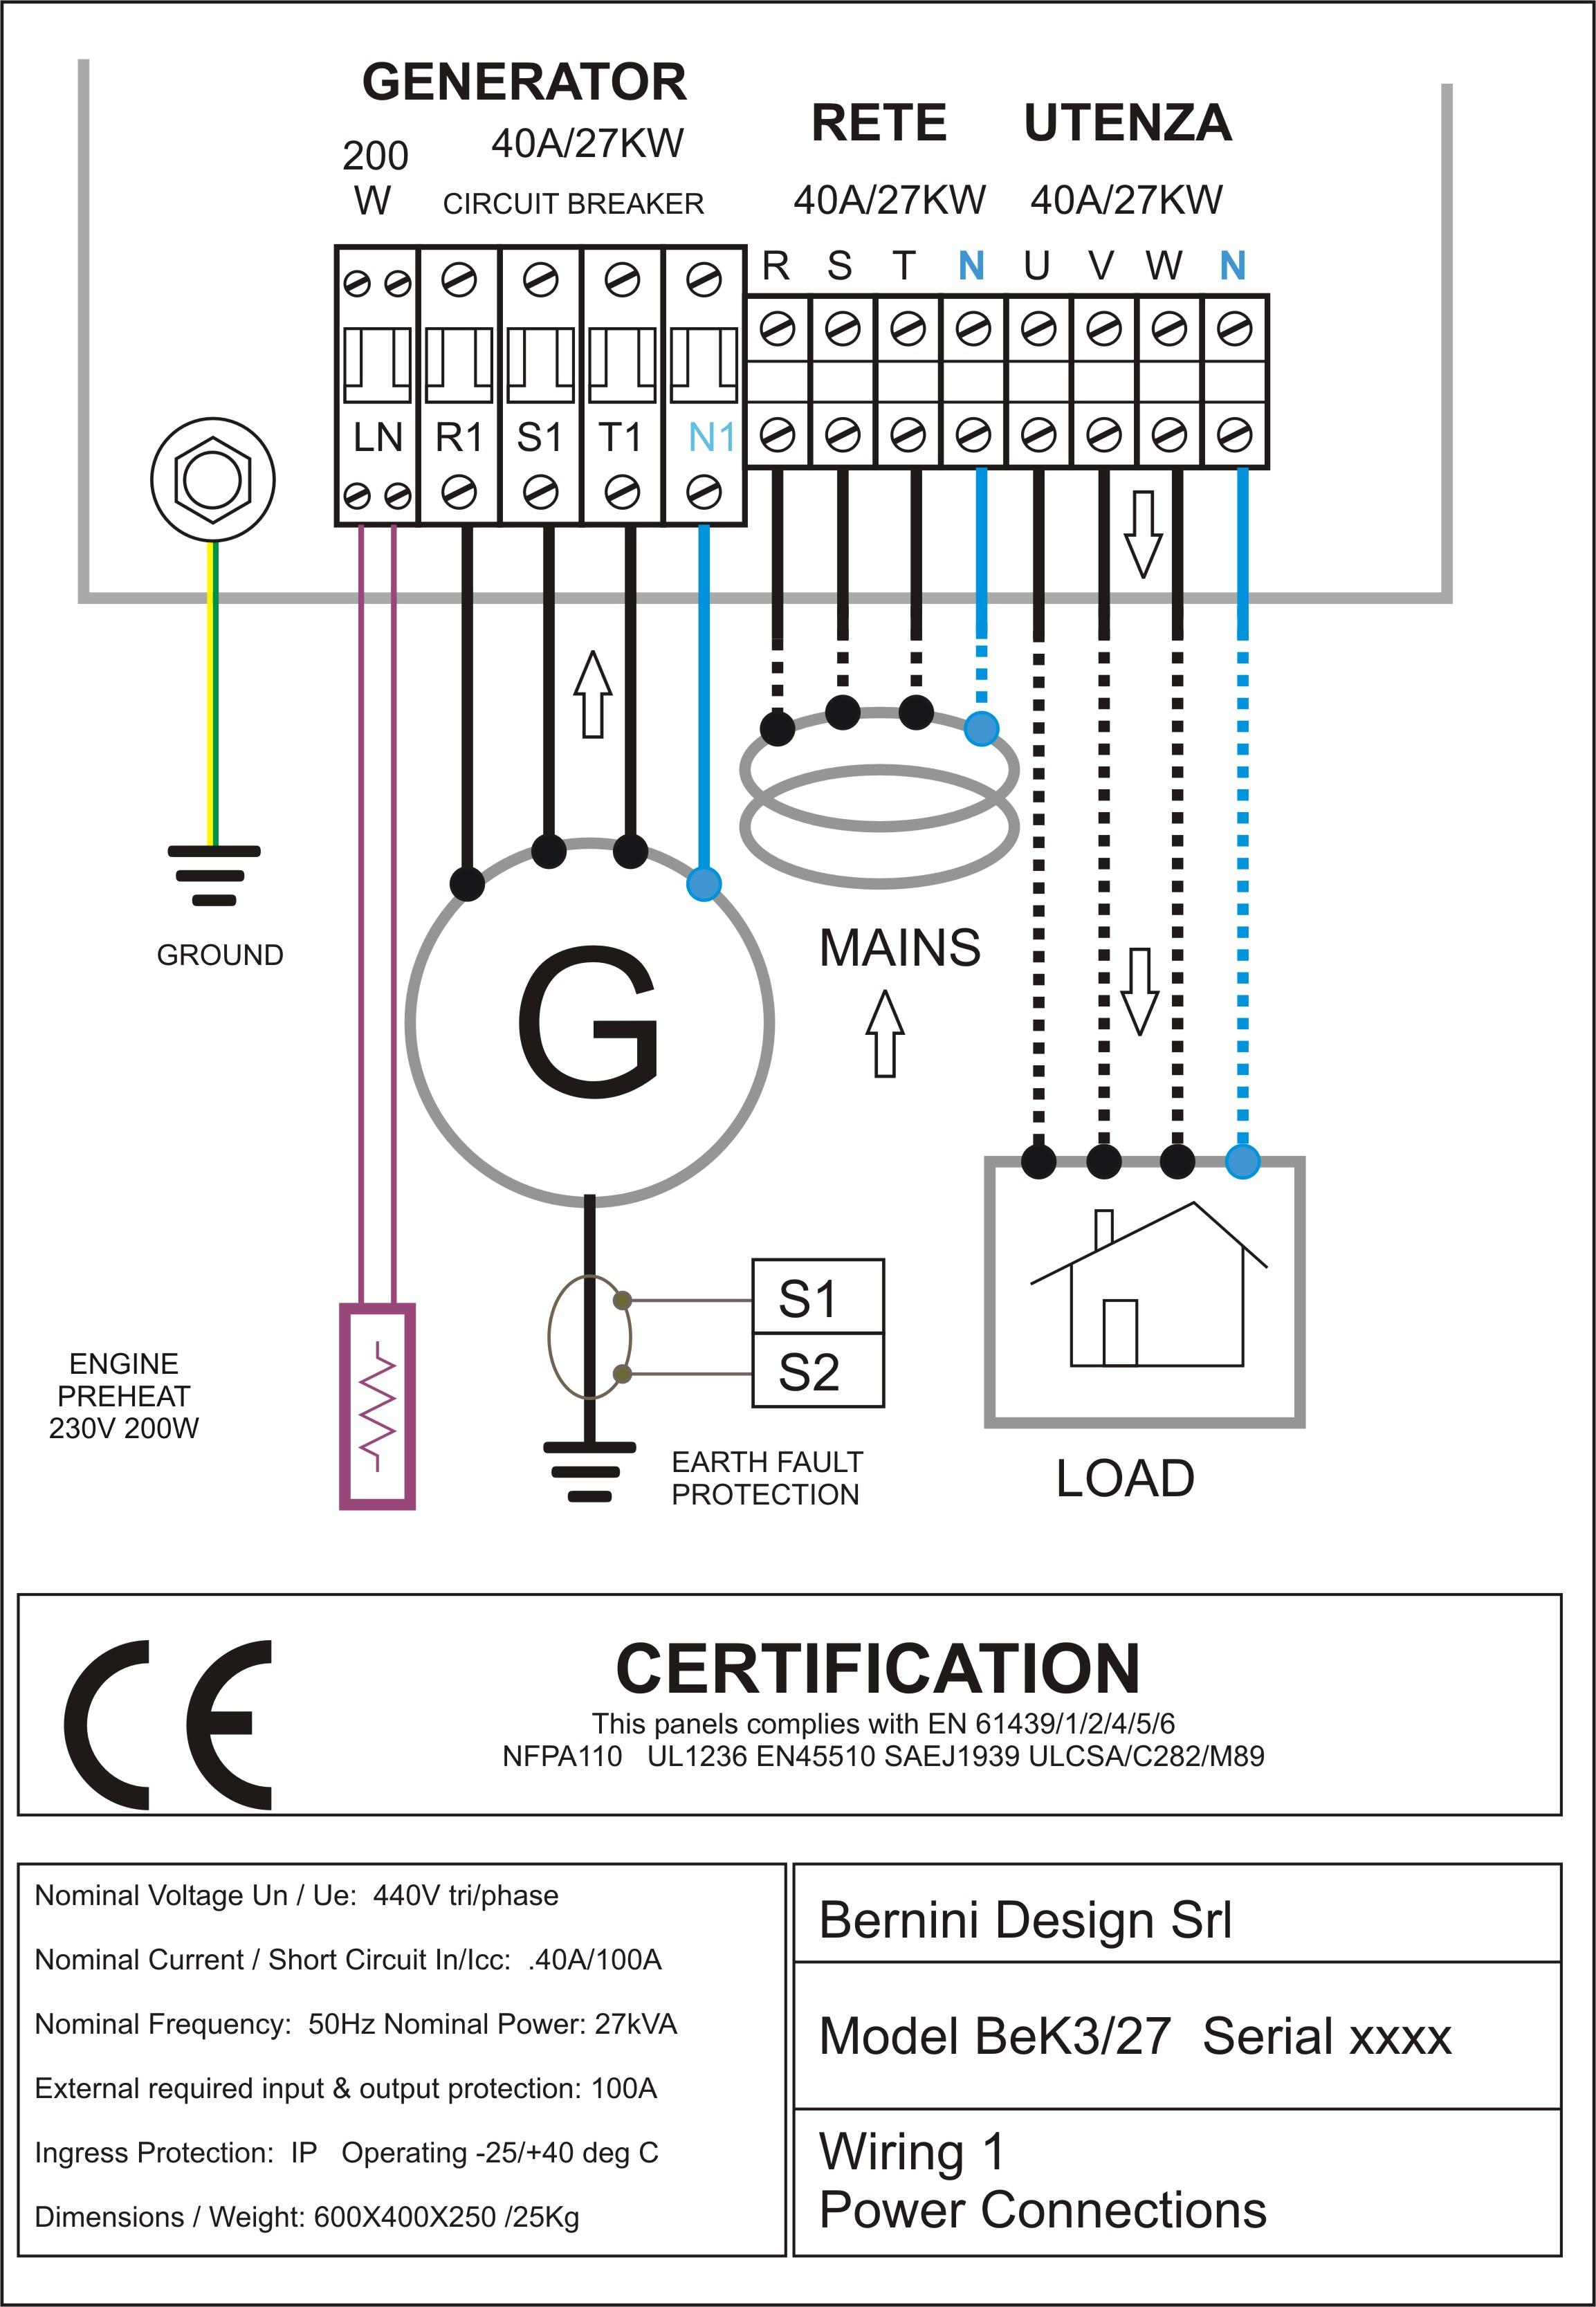 wiring diagram creator wiring diagram and schematic design Wiring Diagram Tool wiring diagram tool wiring diagram, wiring diagram wiring diagram tool